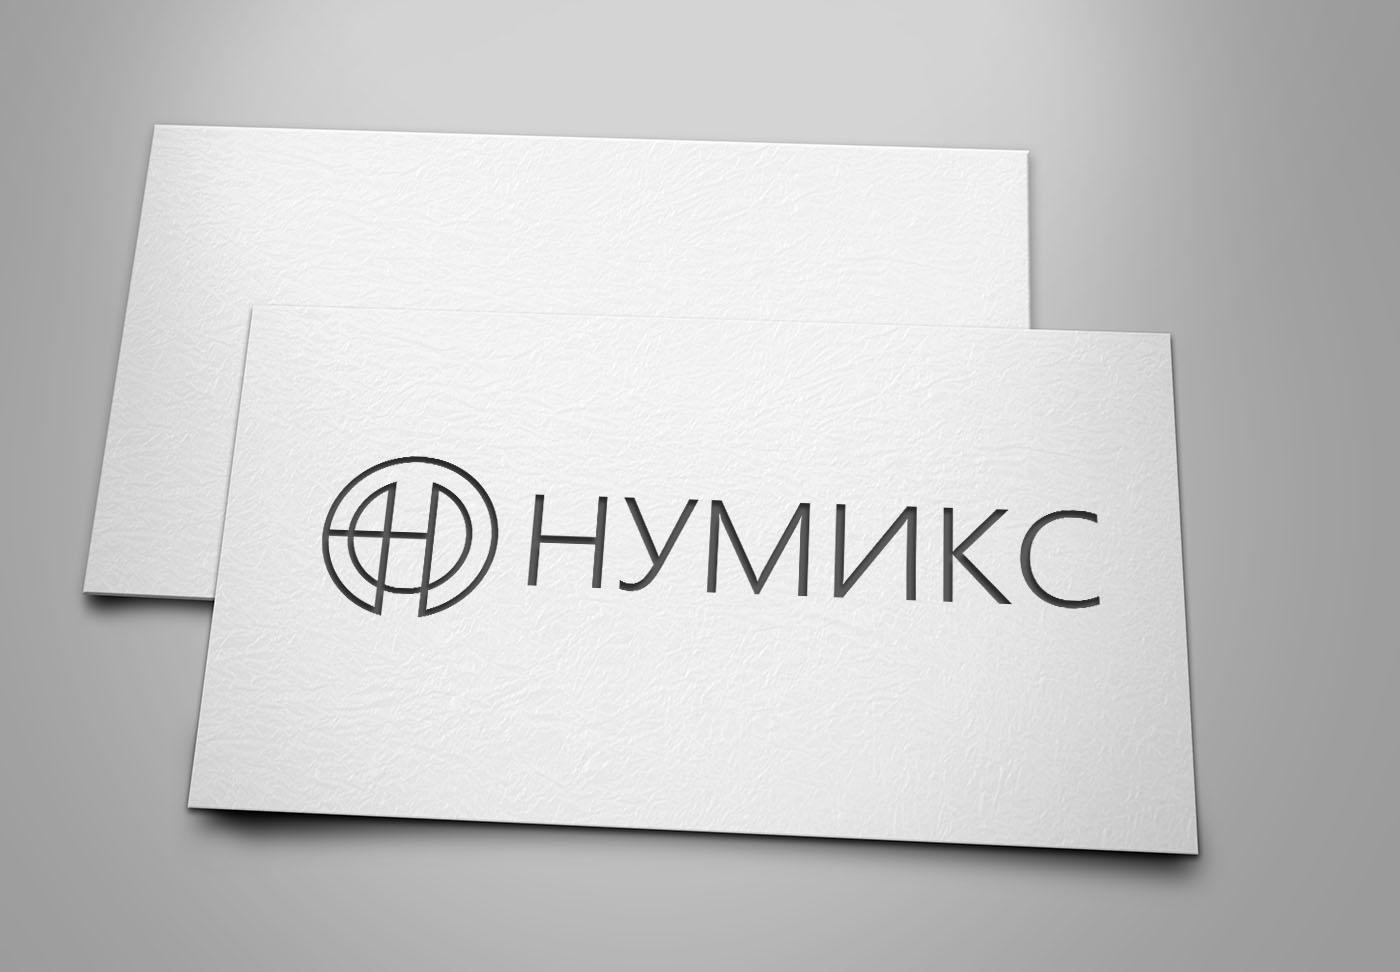 Логотип для интернет-магазина фото f_9255ec81183855d9.jpg